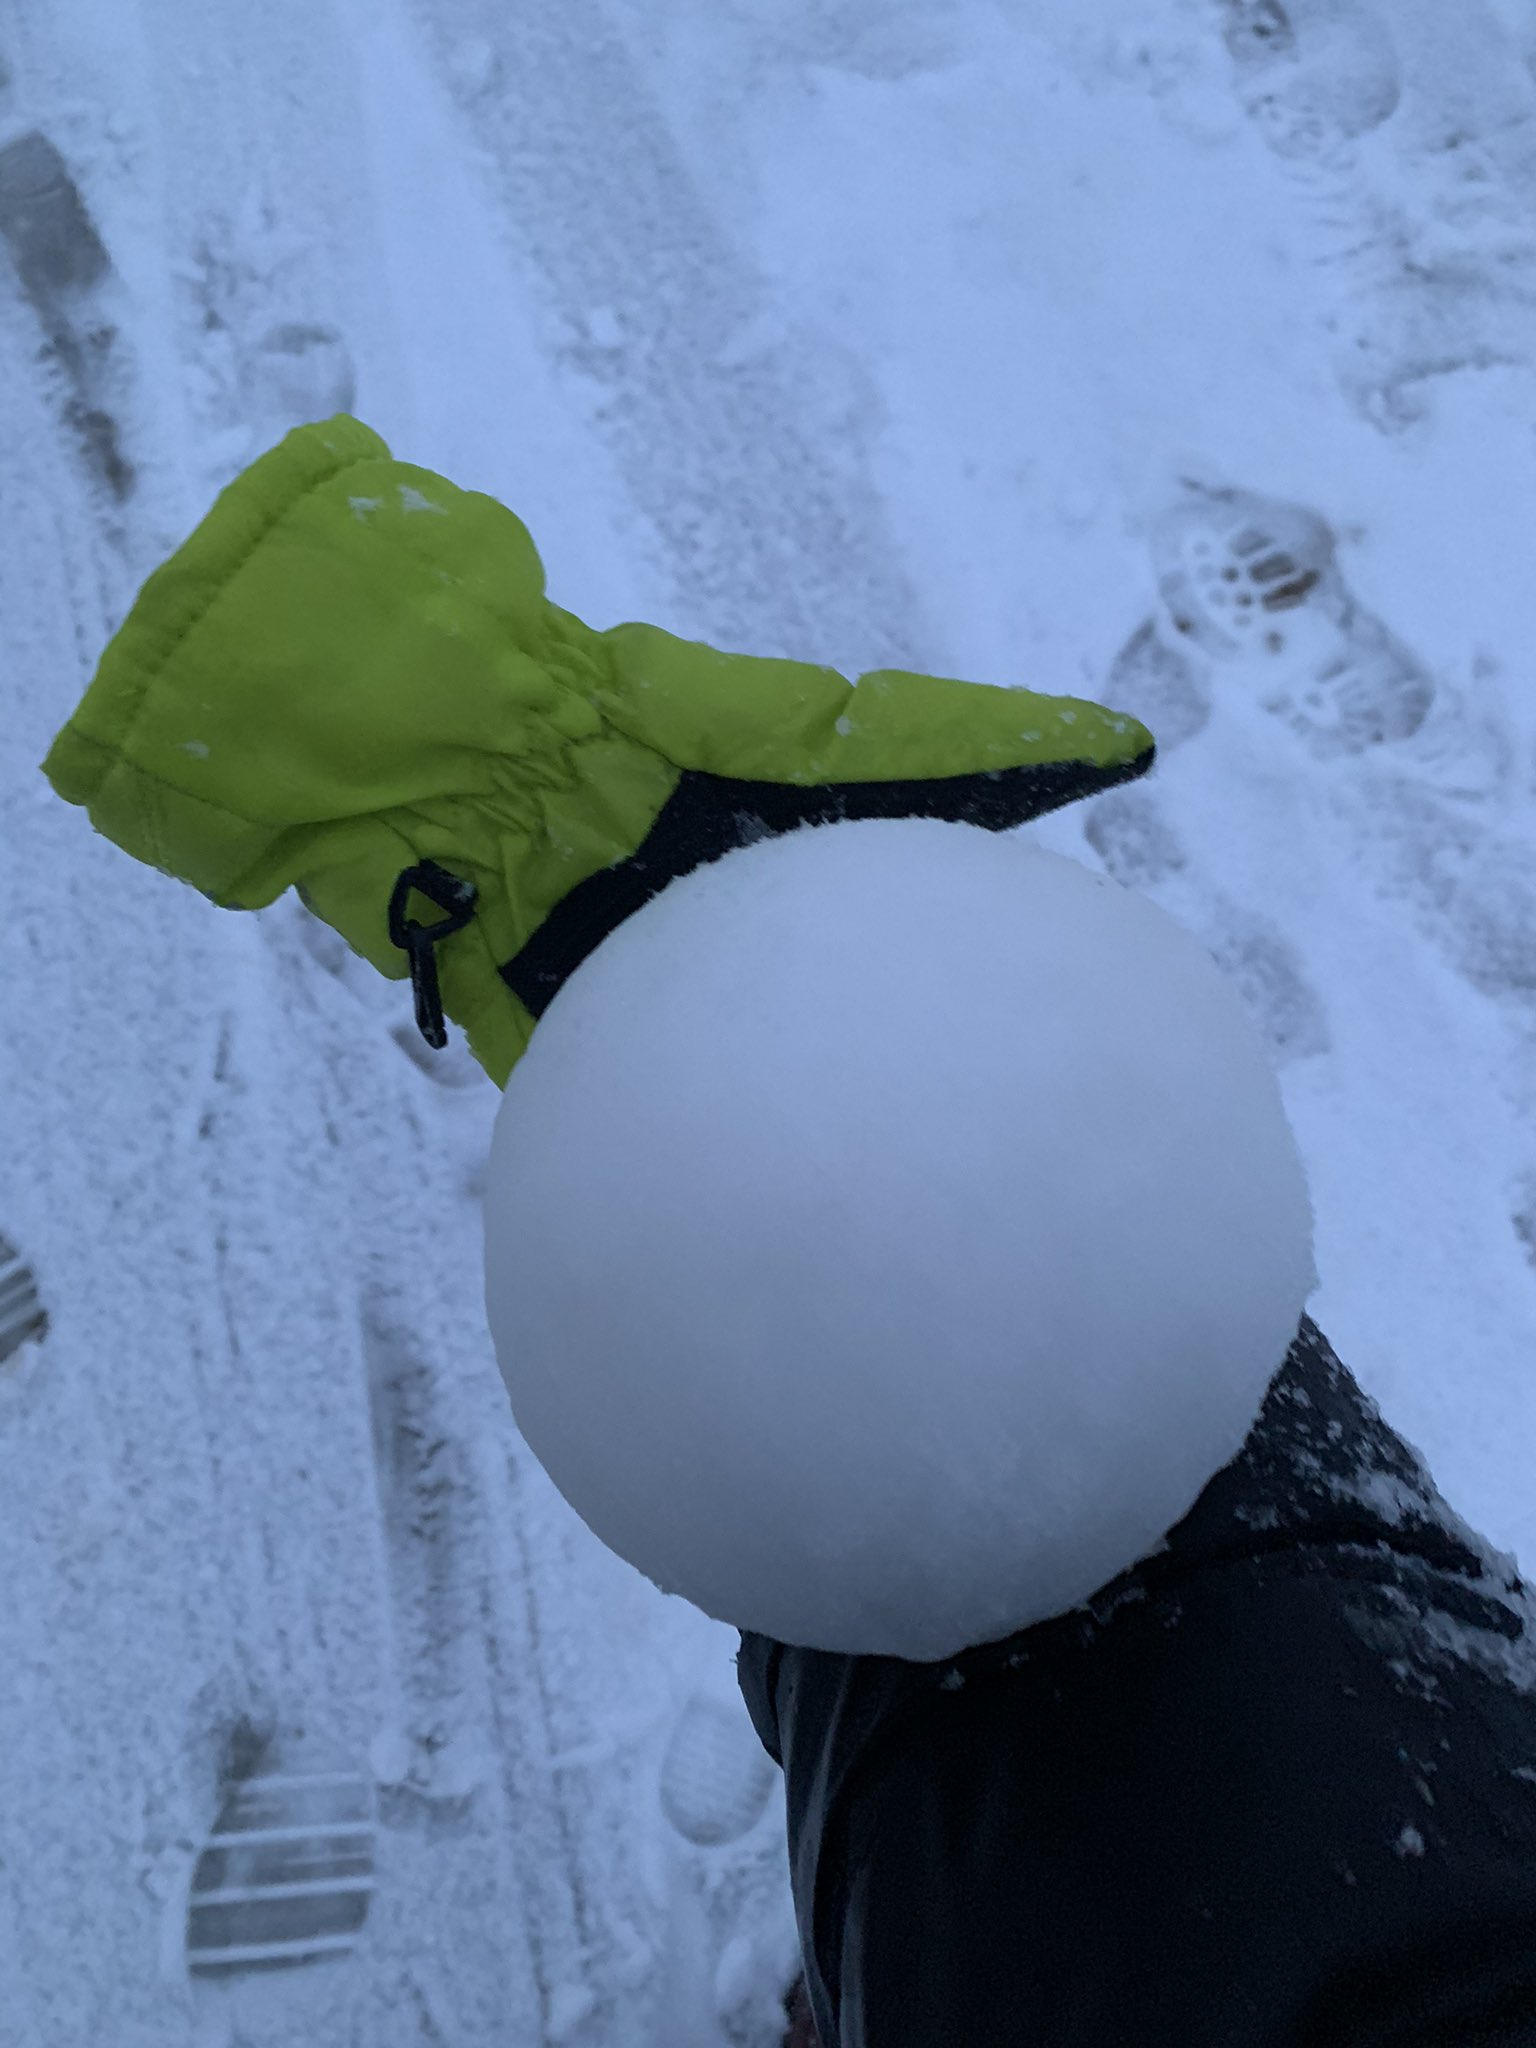 bola de nieve perfecta